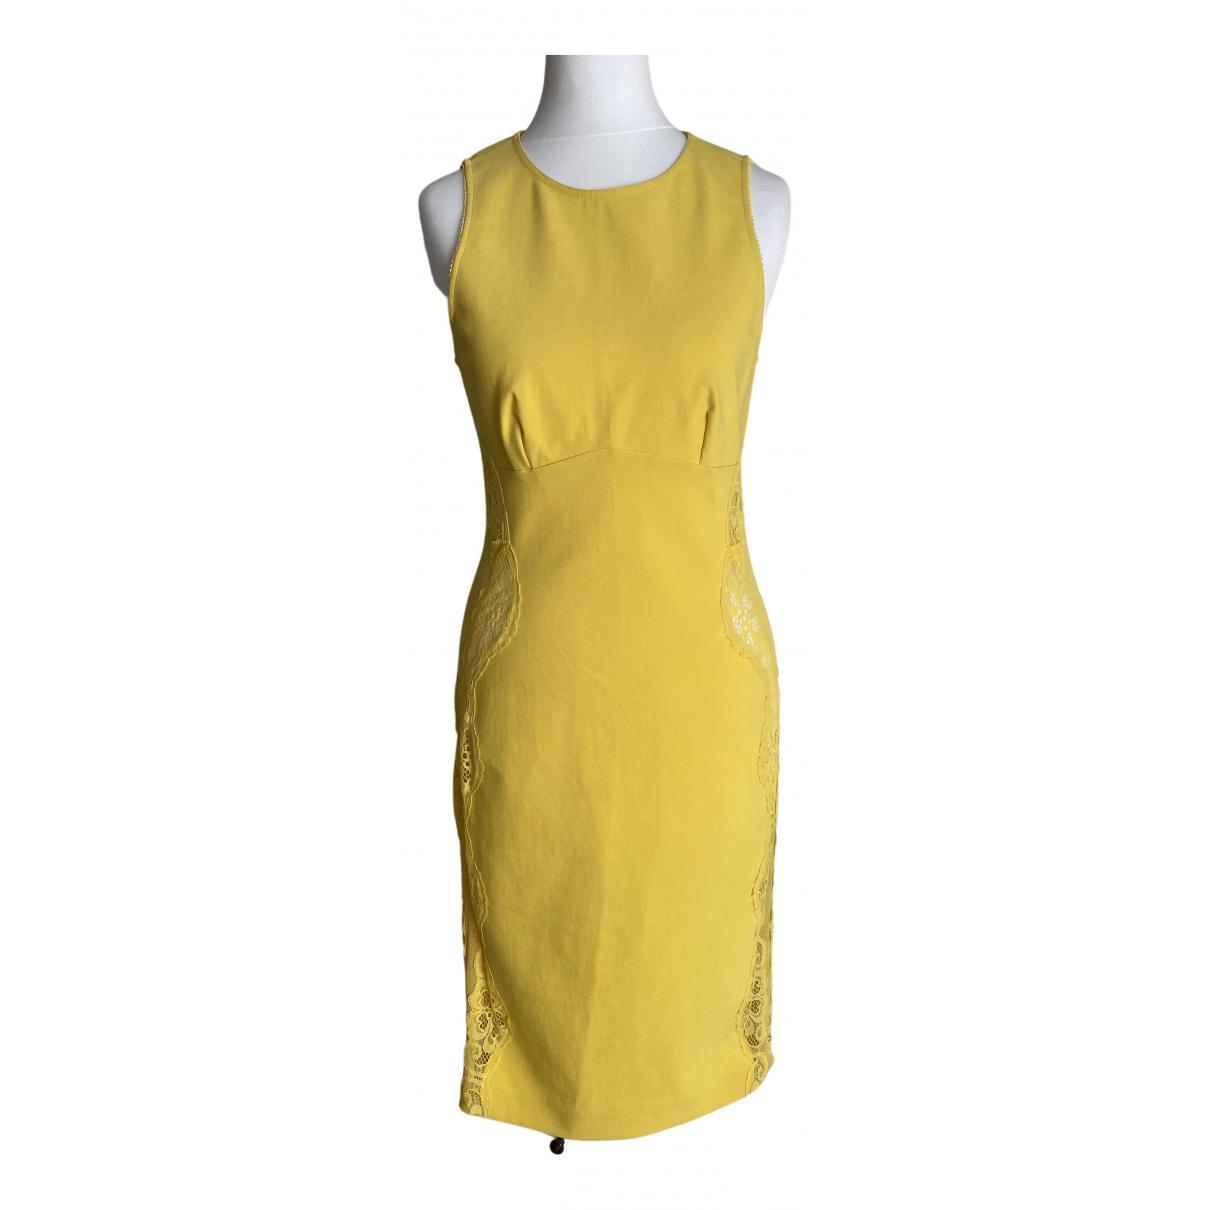 Stella Mccartney \N Yellow Cotton dress for Women 40 IT